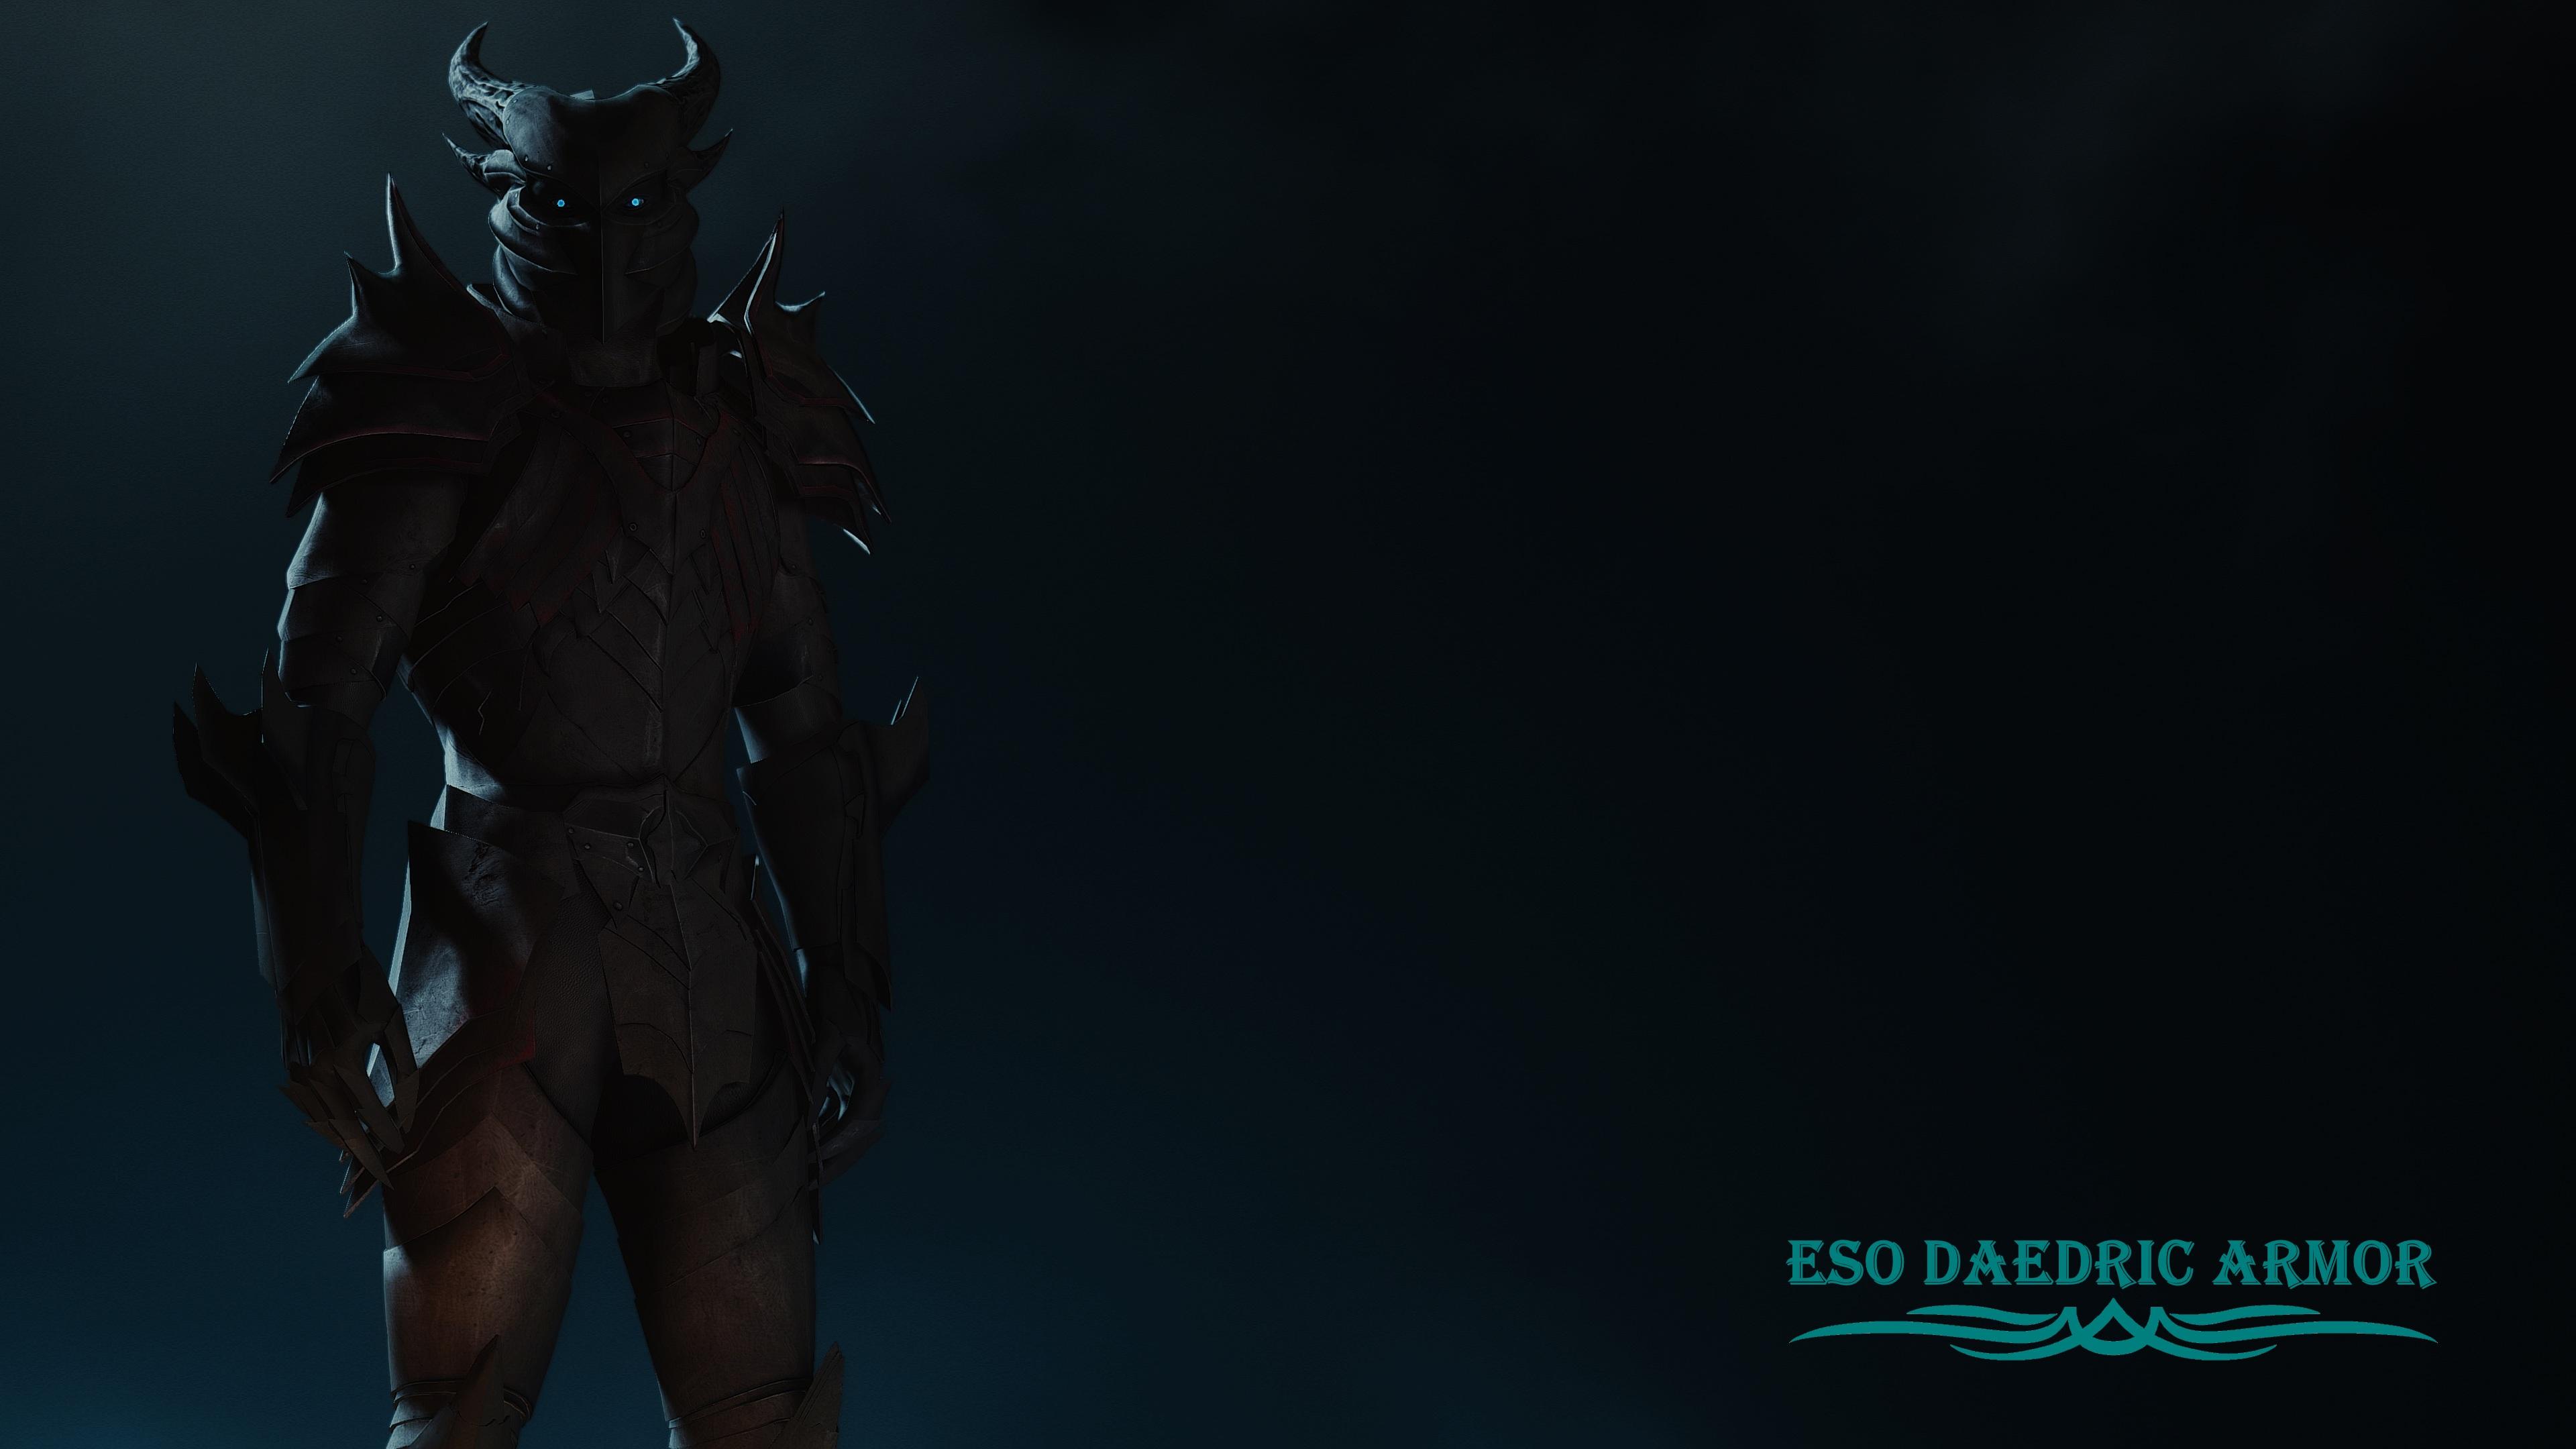 ESO_Daedric_Armor.jpg